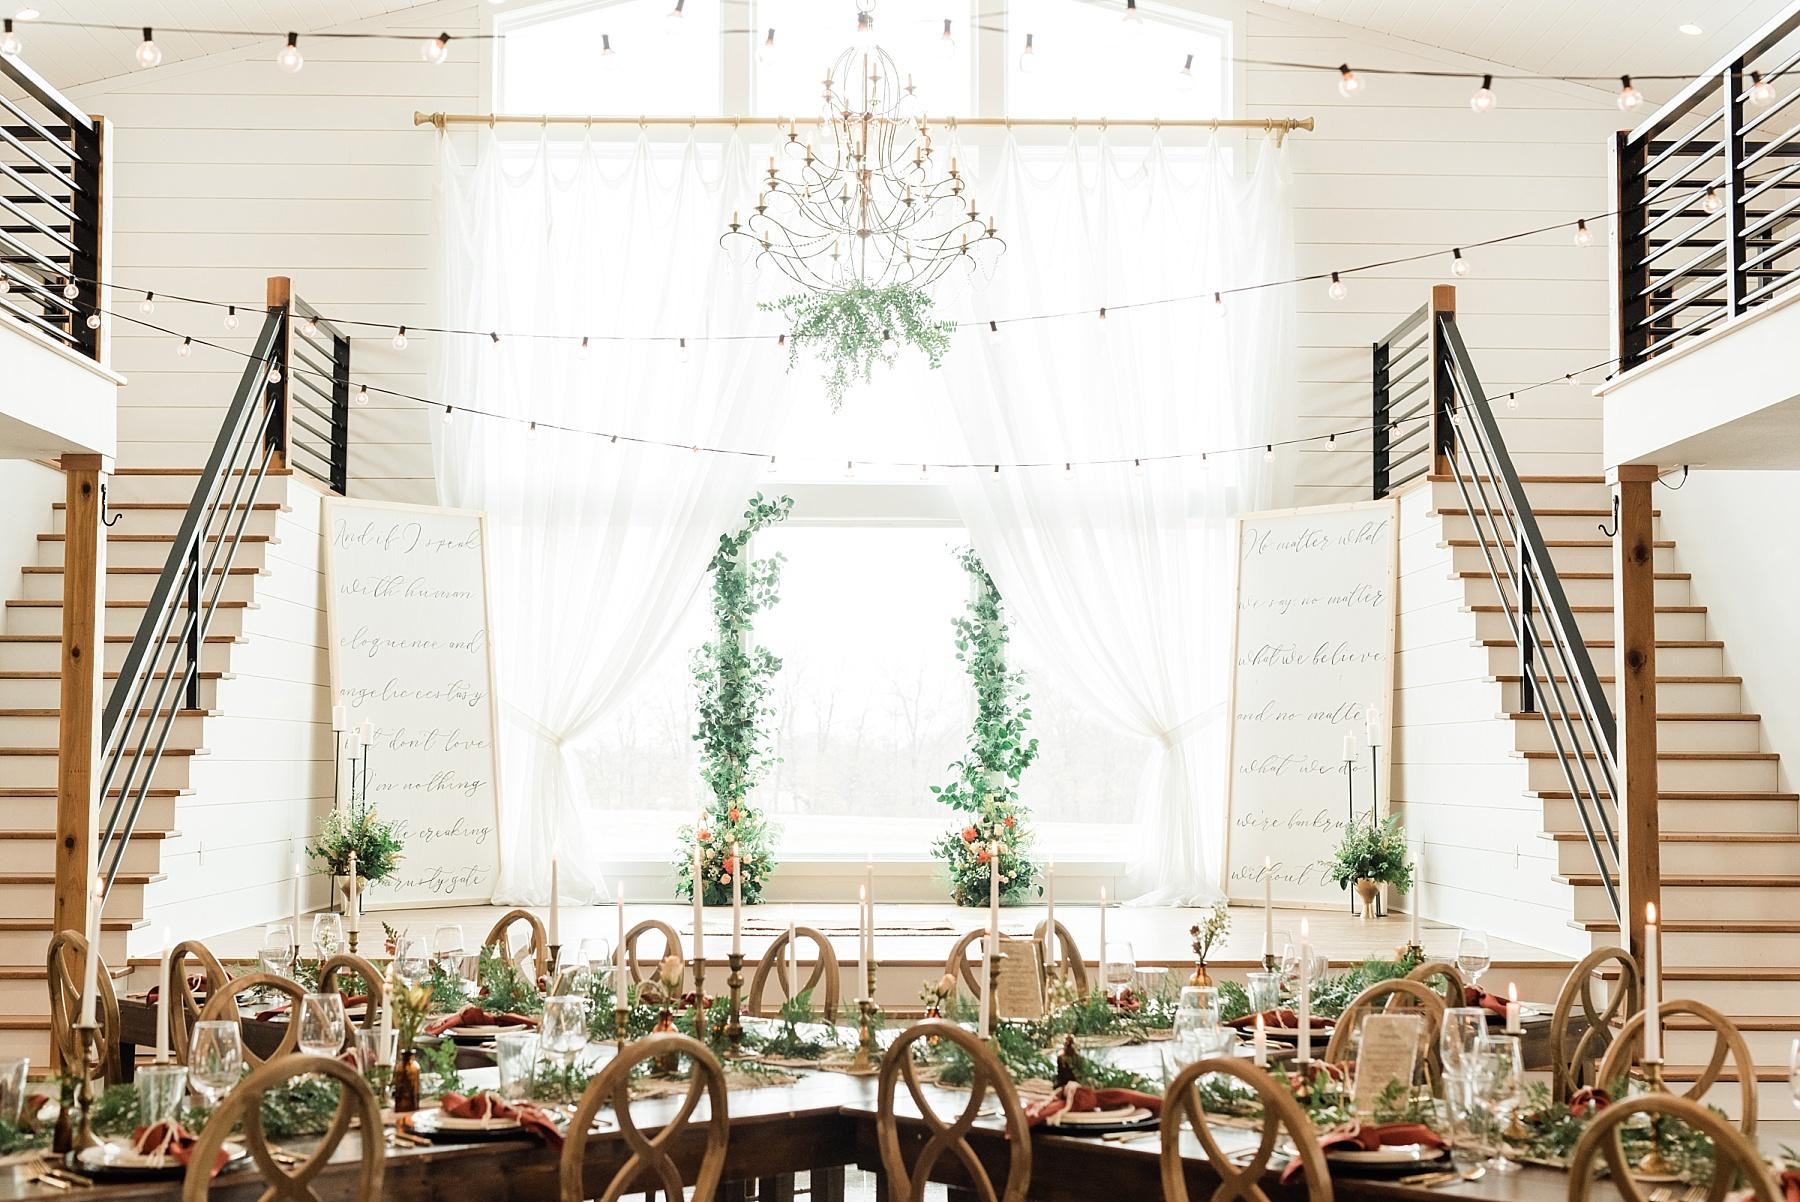 Eclectic Scandinavian Winter Wedding in All White Venue Emerson Fields by Kelsi Kliethermes Photography Best Missouri and Maui Wedding Photographer_0028.jpg